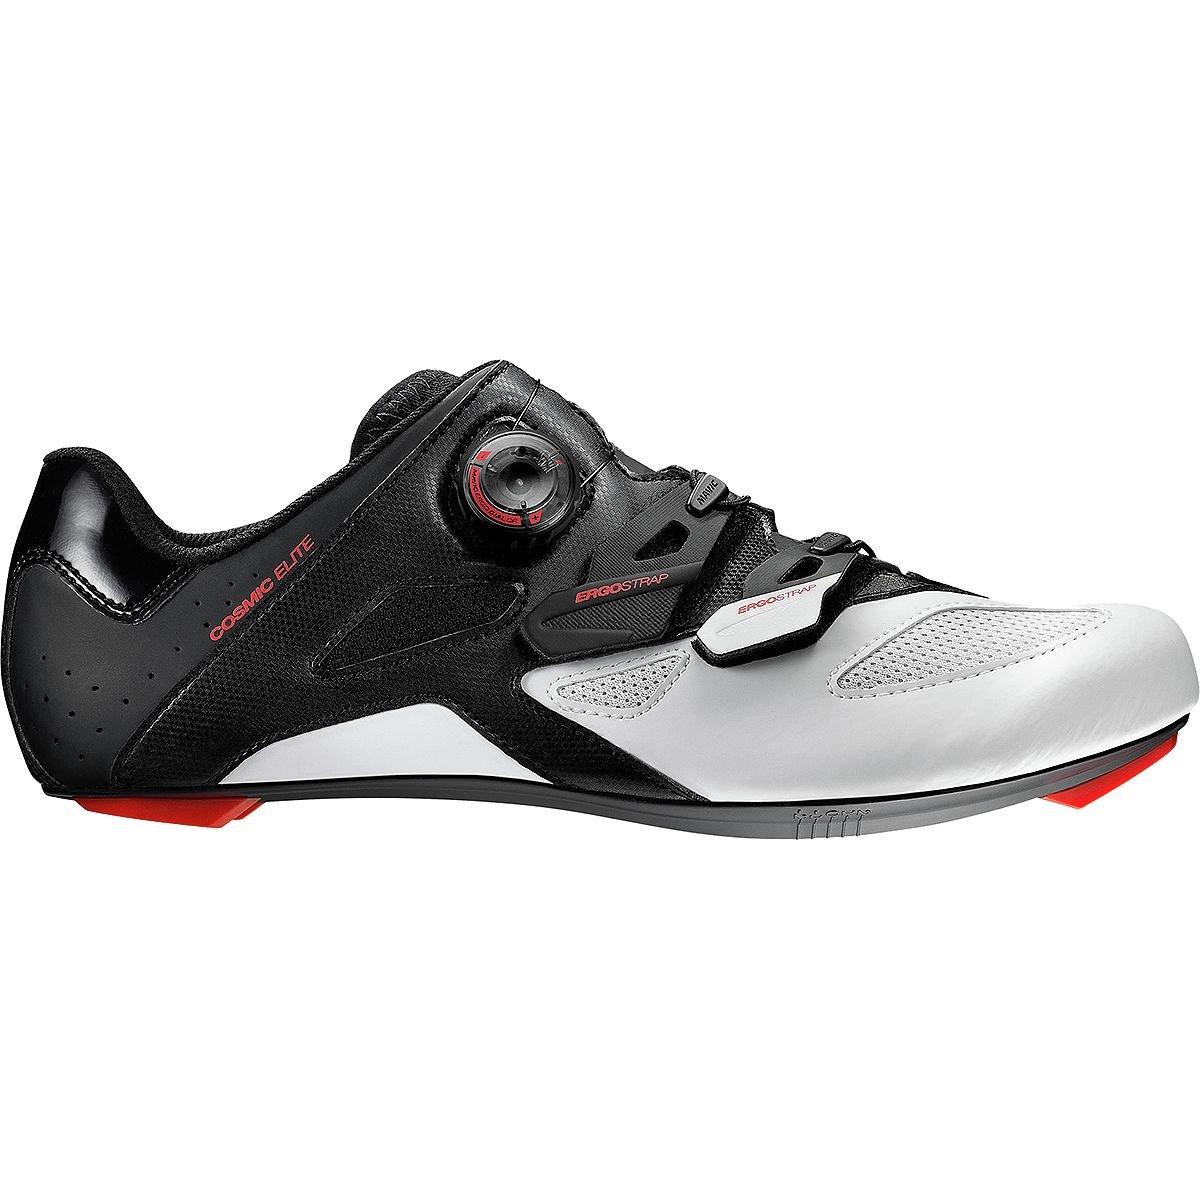 Mavic Cosmic Elite Cycling Shoes – Men 's B01M1RRXSP 12 D(M) US Black/White/Fiery Red